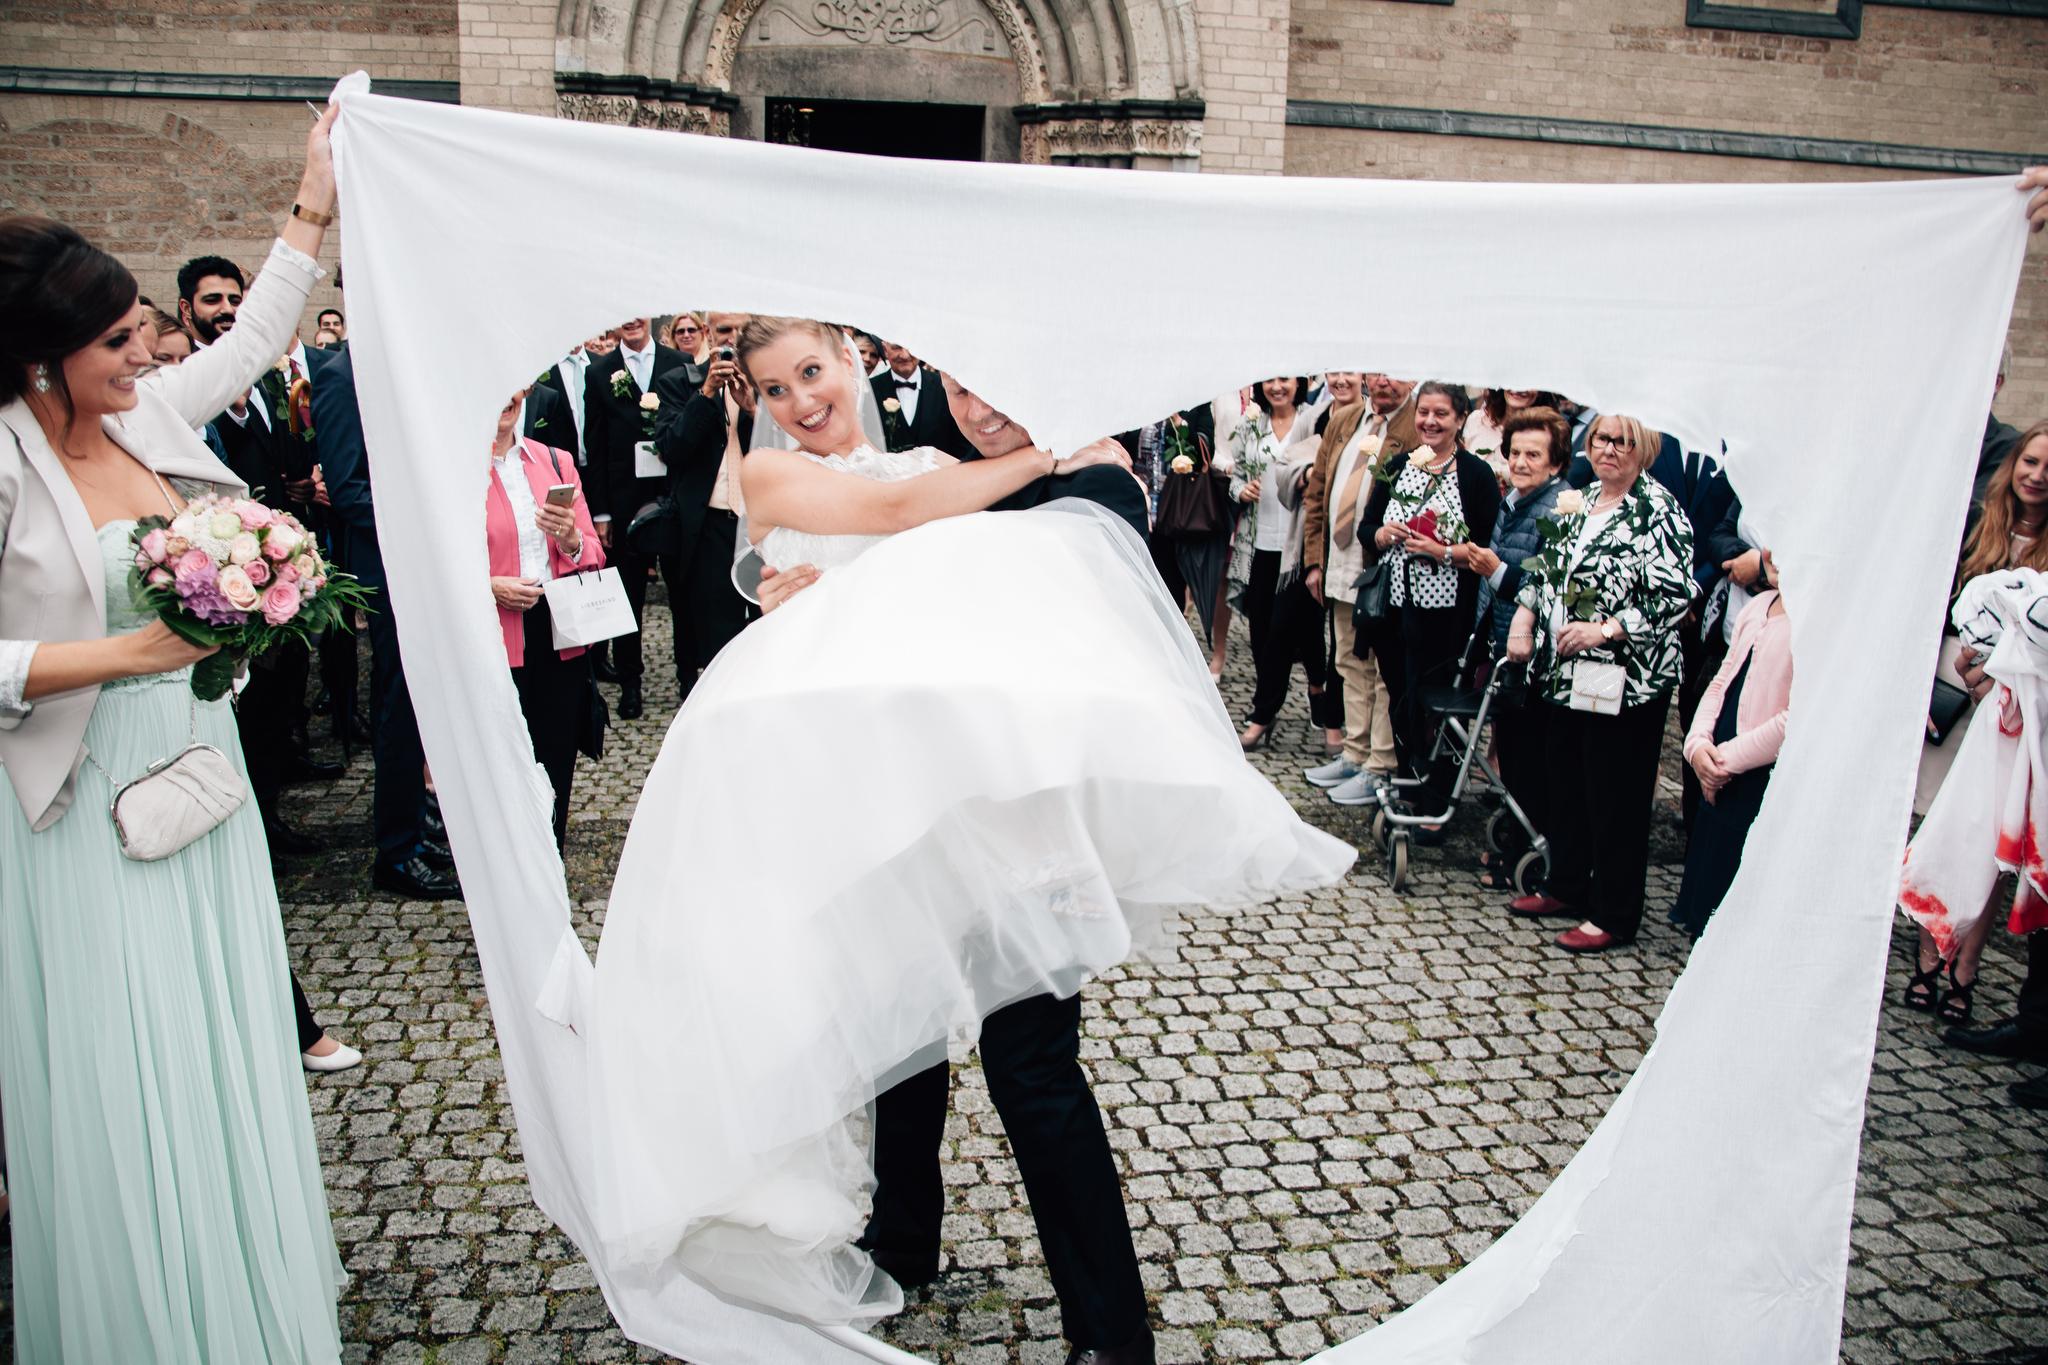 Claudia Krawinkel Fotografie Hochzeitsfotograf Essen Düsseldorf Dormagen Kloster Knechtsteden Hochzeitsreportage Hochzeit Knechtsteden93